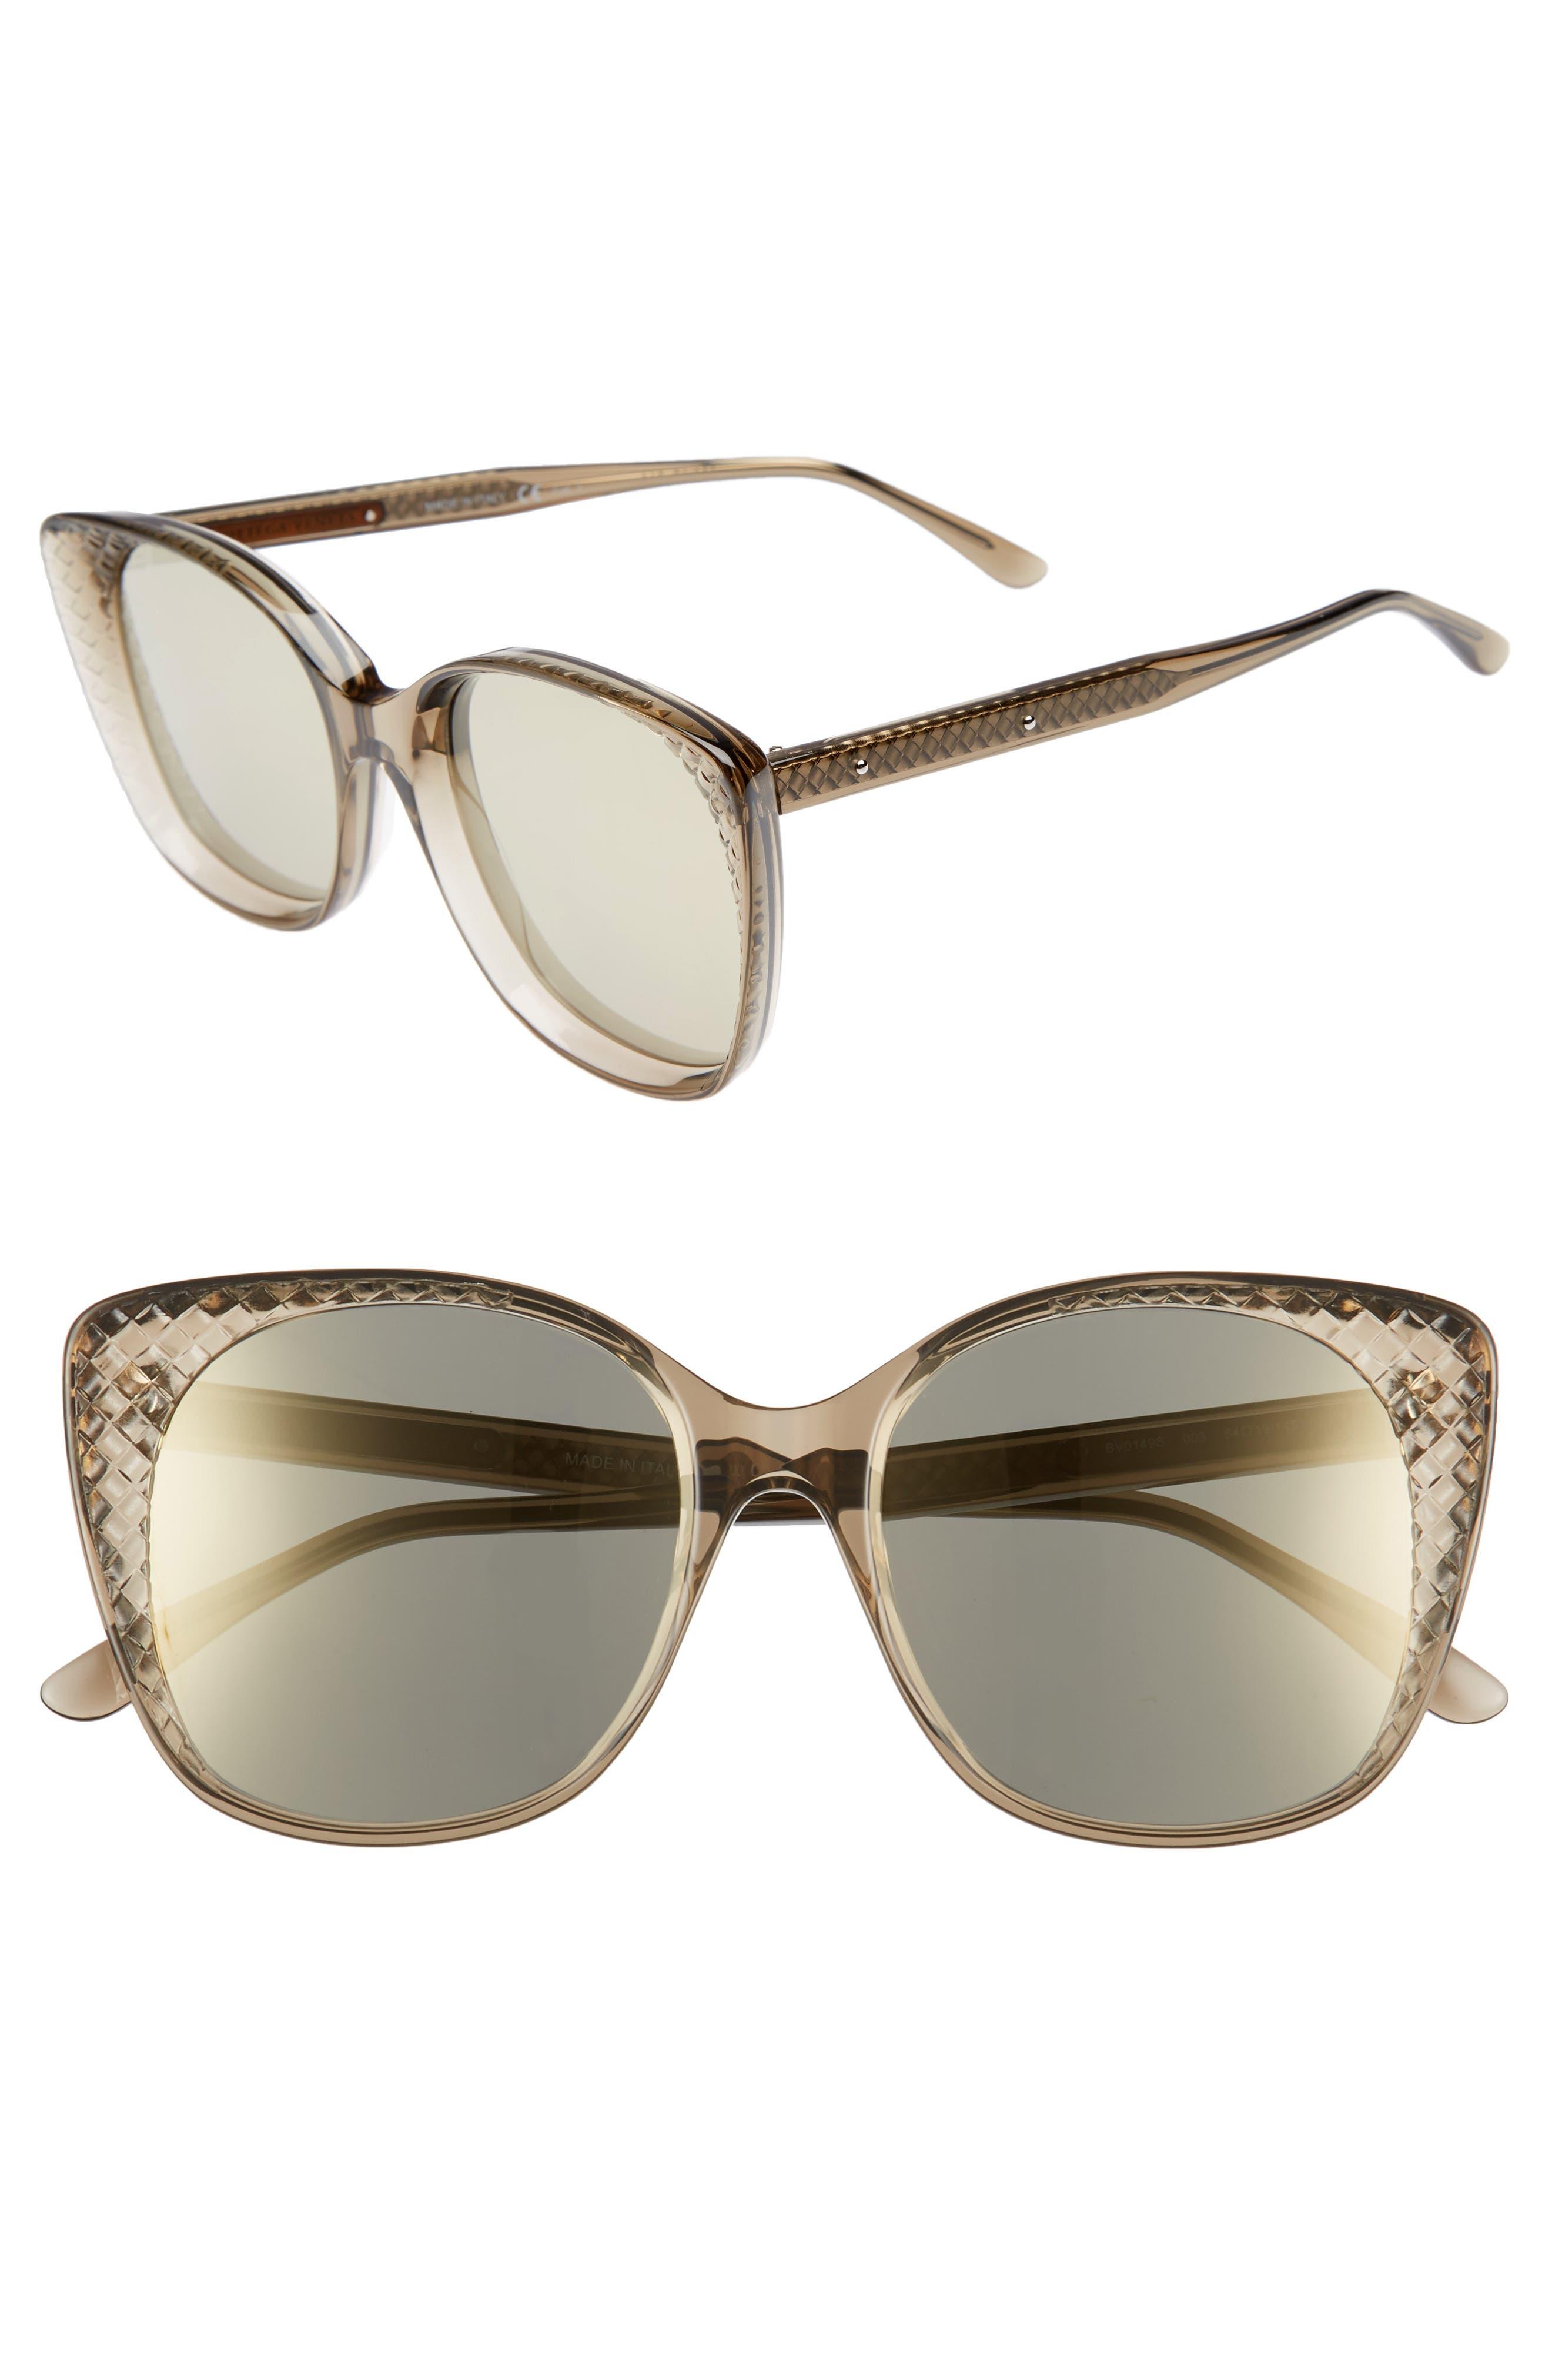 54mm Sunglasses,                         Main,                         color, BROWN